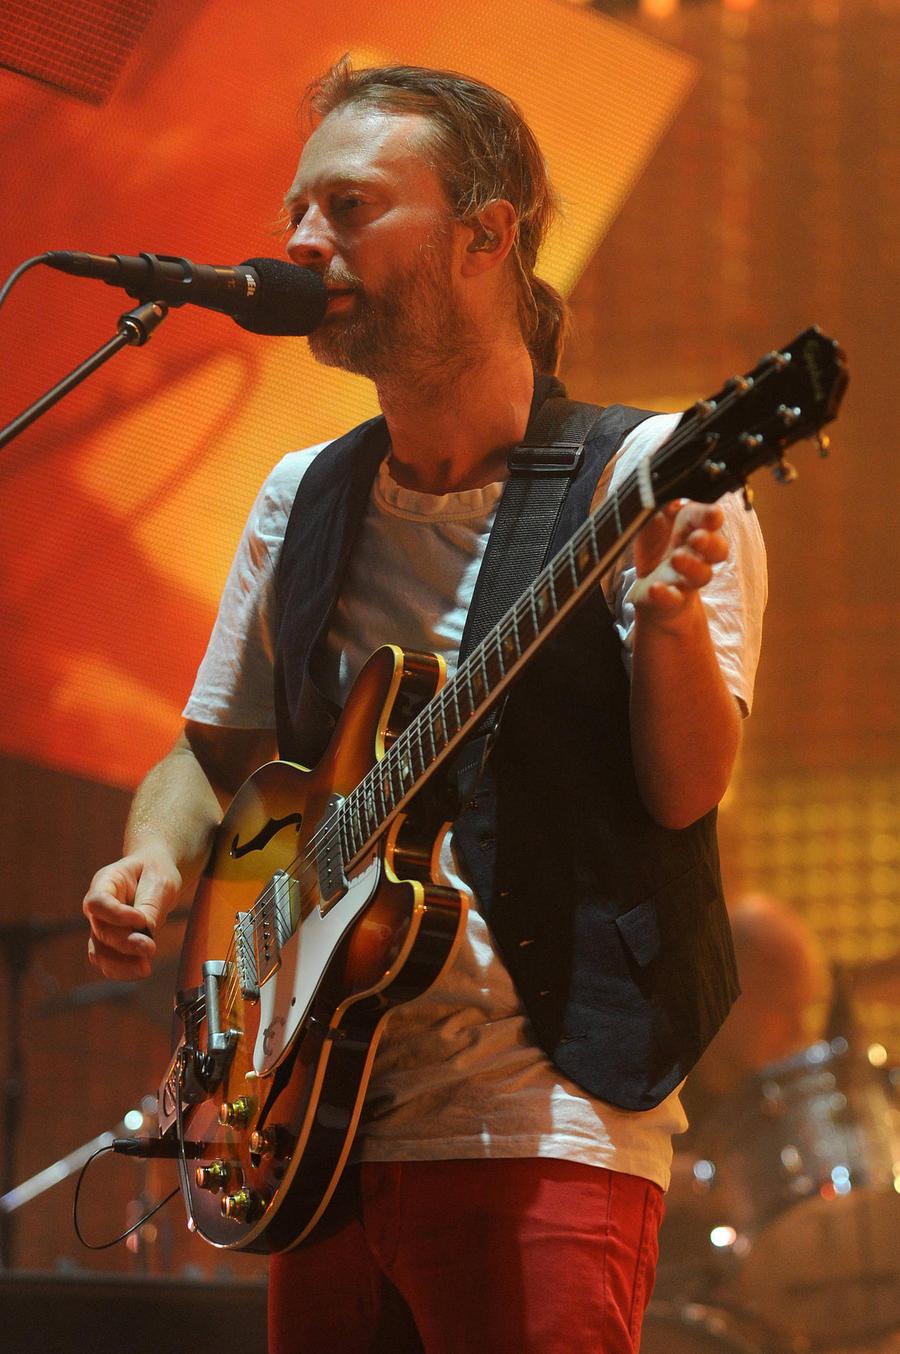 Thom Yorke's Longtime Partner Passes Away Aged 48